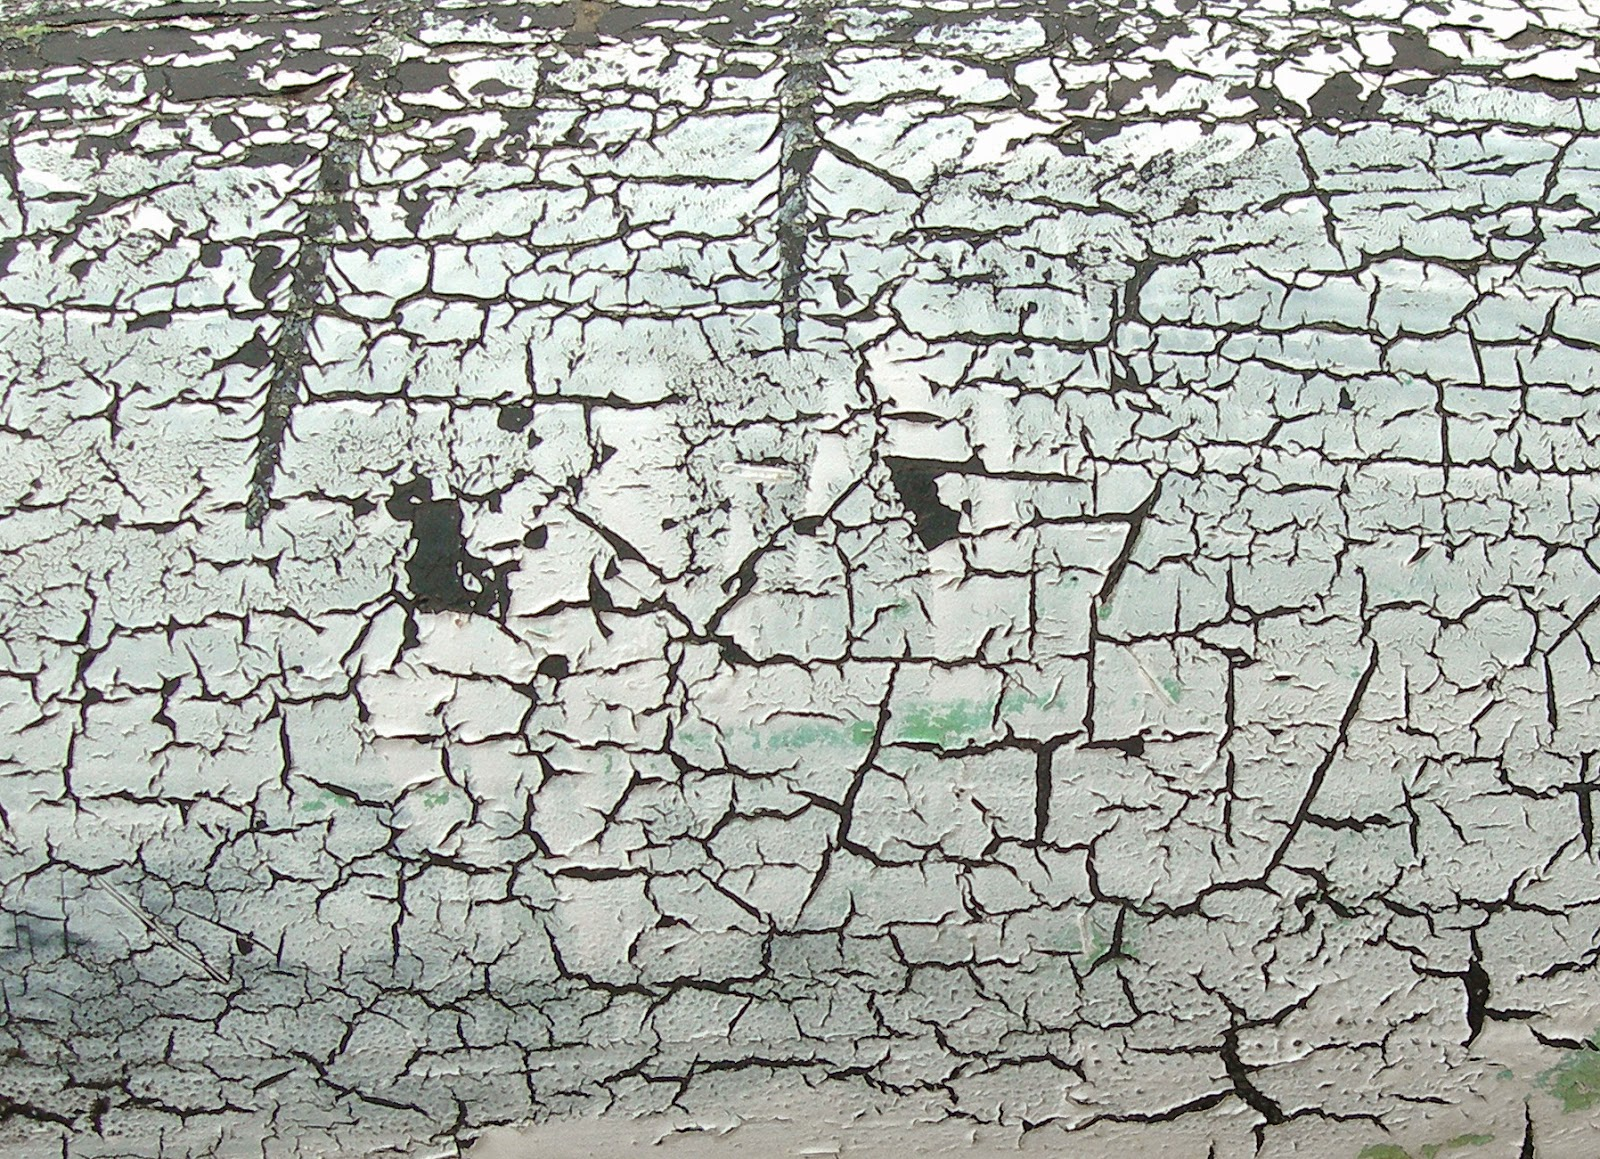 Amazing Cracked Peeling Nails Photos - Nail Art Ideas - morihati.com